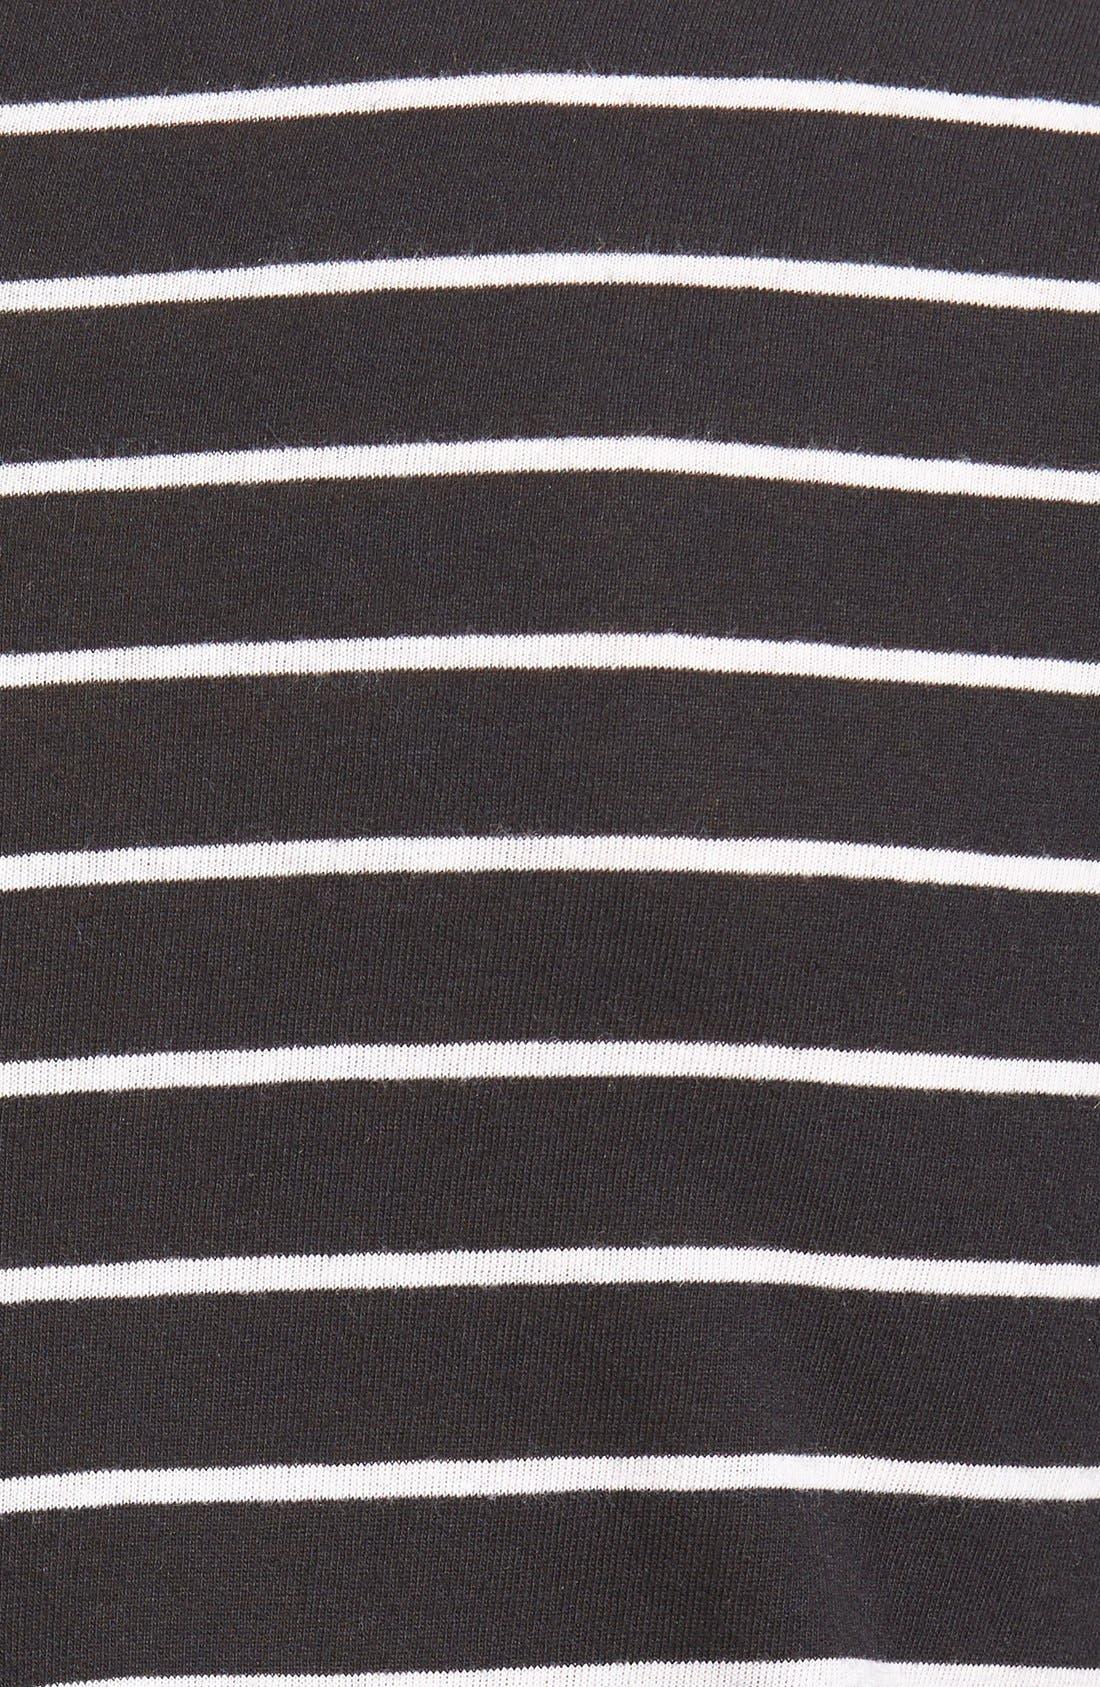 BP., Stripe High/Low Tee, Alternate thumbnail 5, color, 001